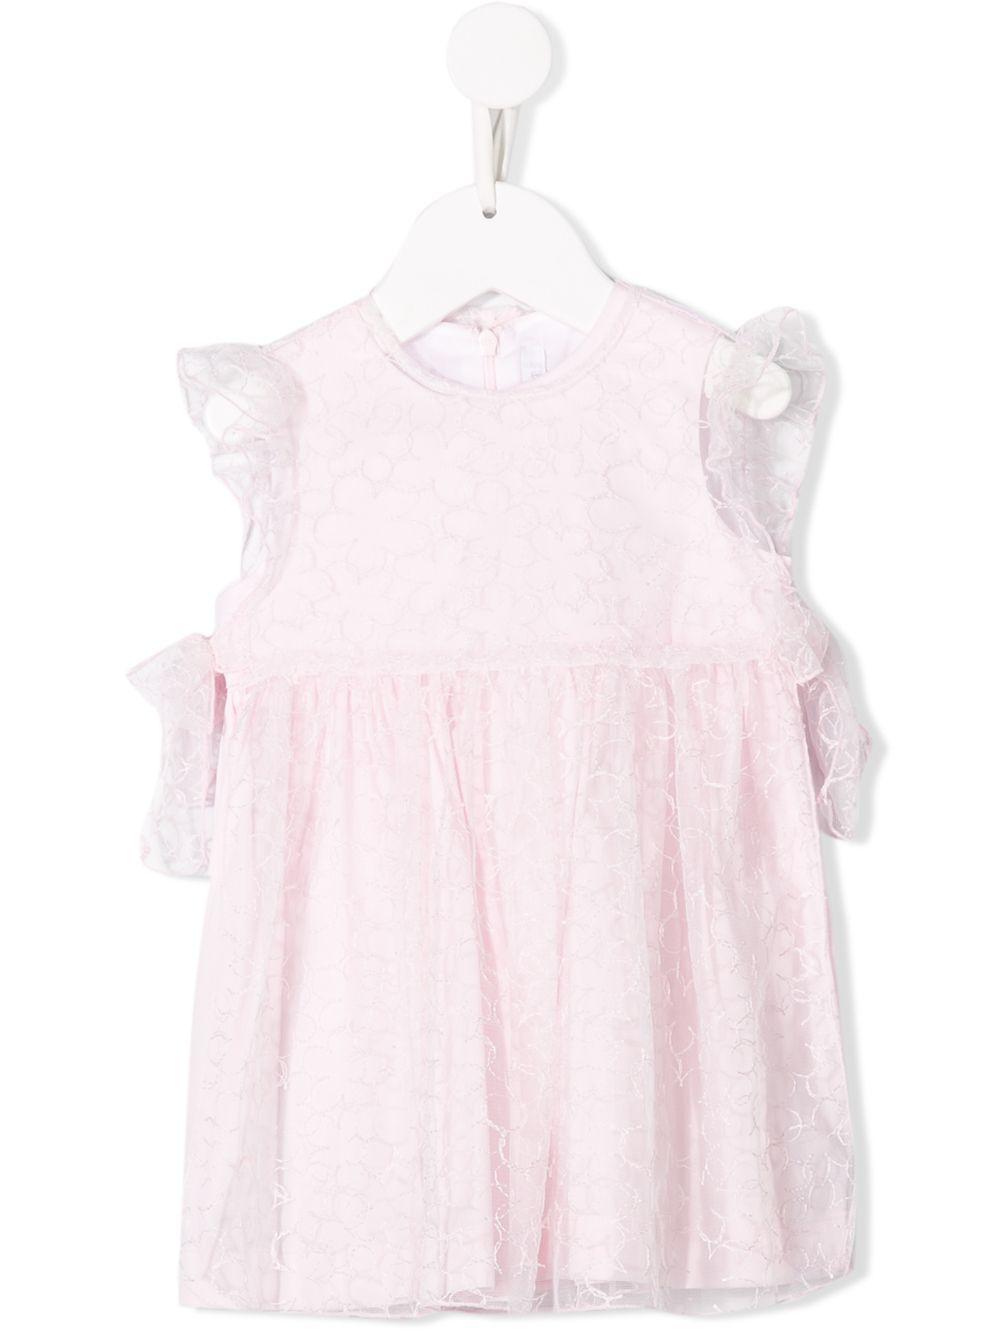 Il Gufo | платье из тюля | Clouty